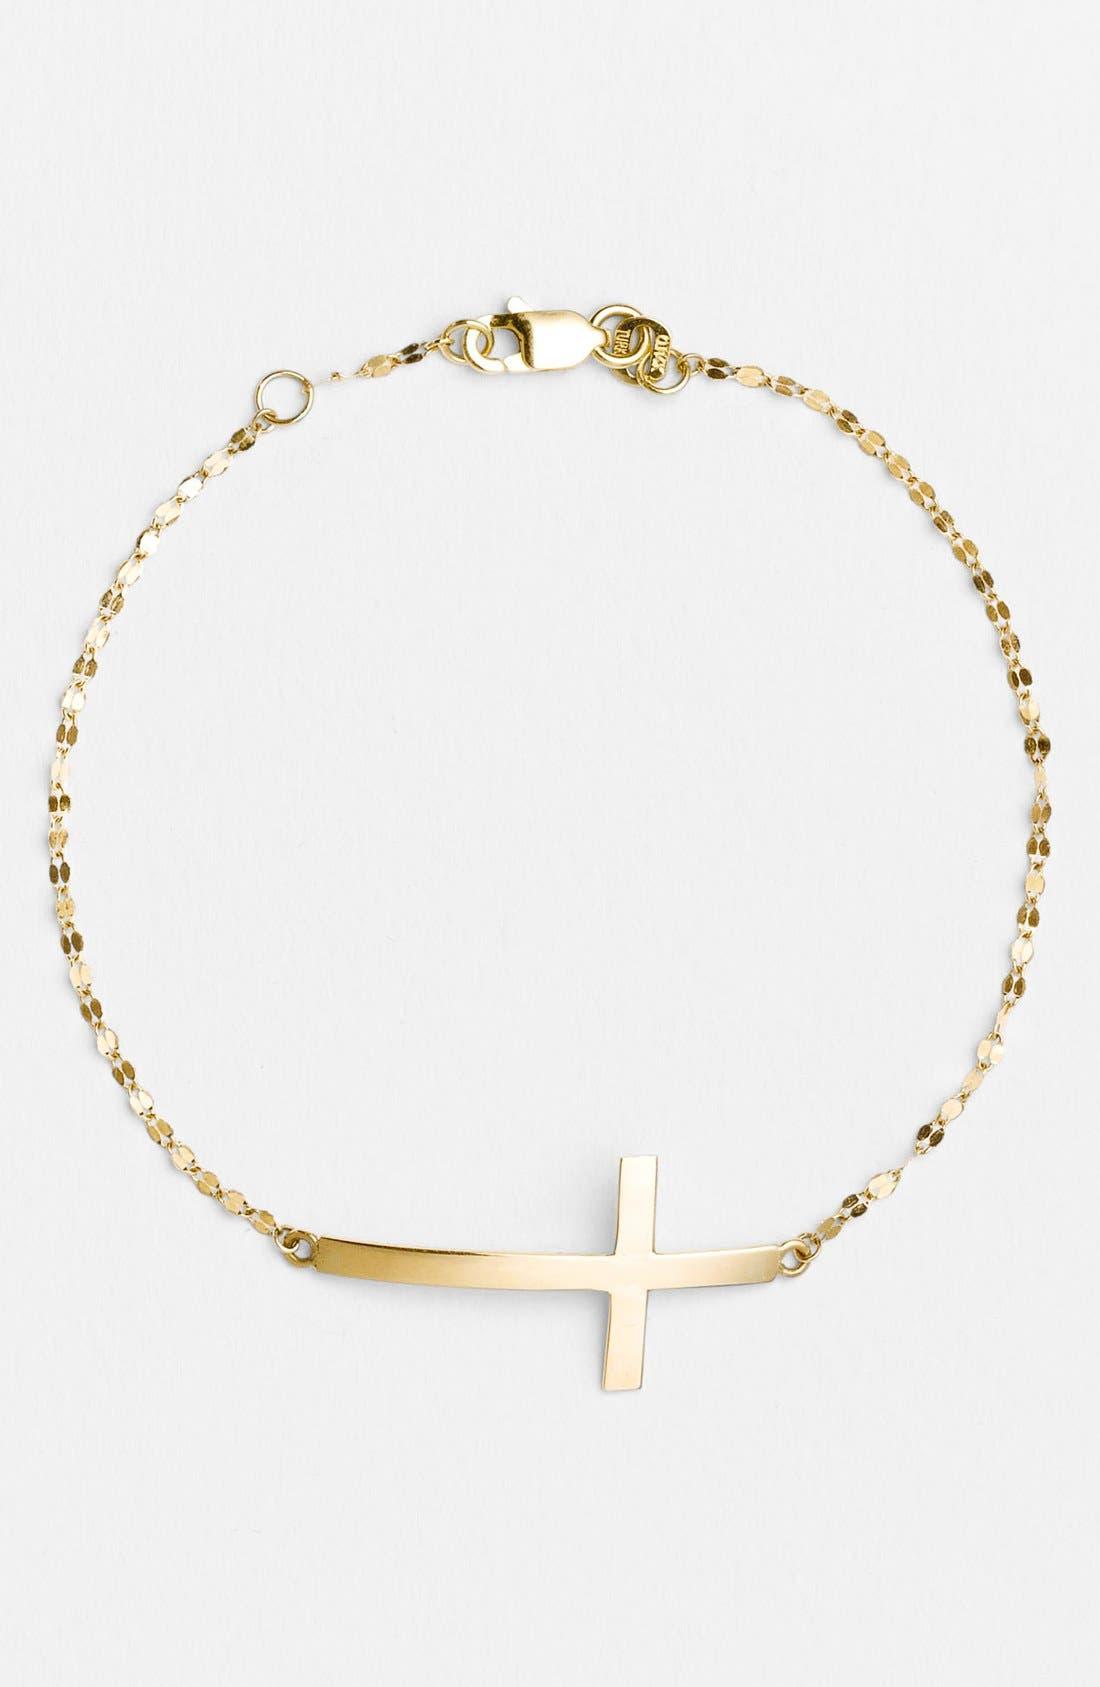 Main Image - Lana Jewelry Cross Station Bracelet